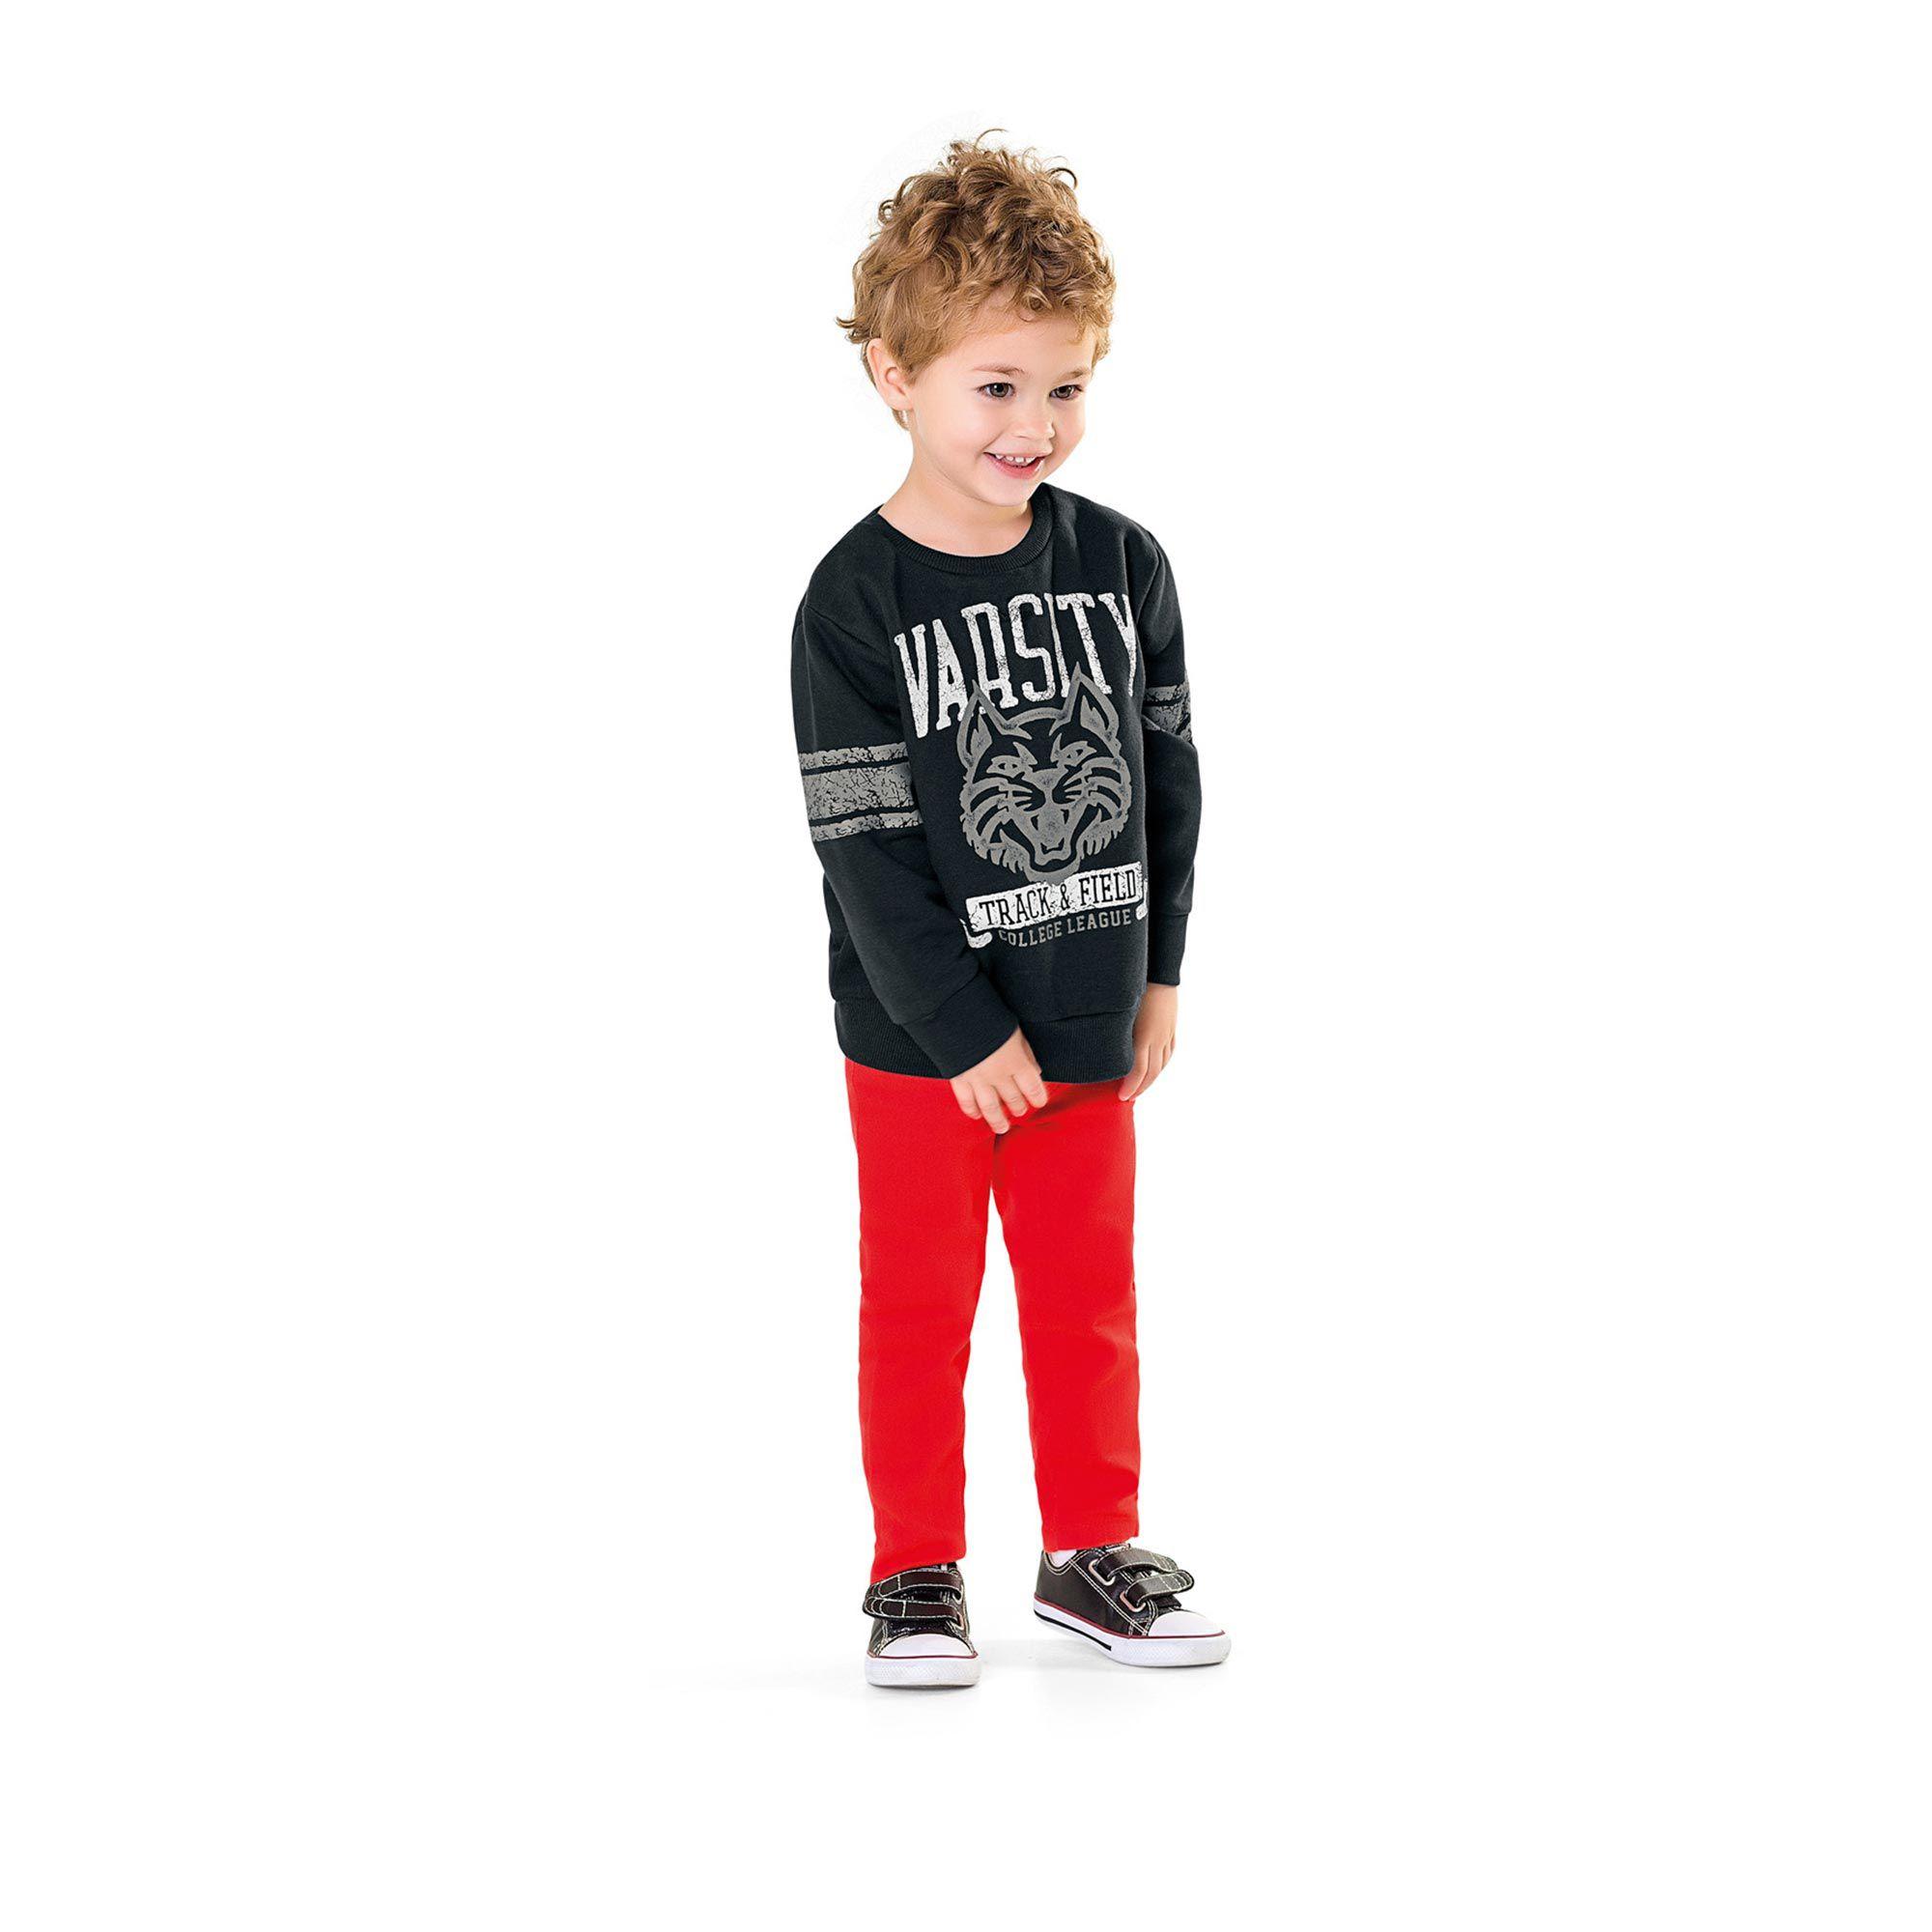 Casaco Infantil Fakini - Varsity Asfalto